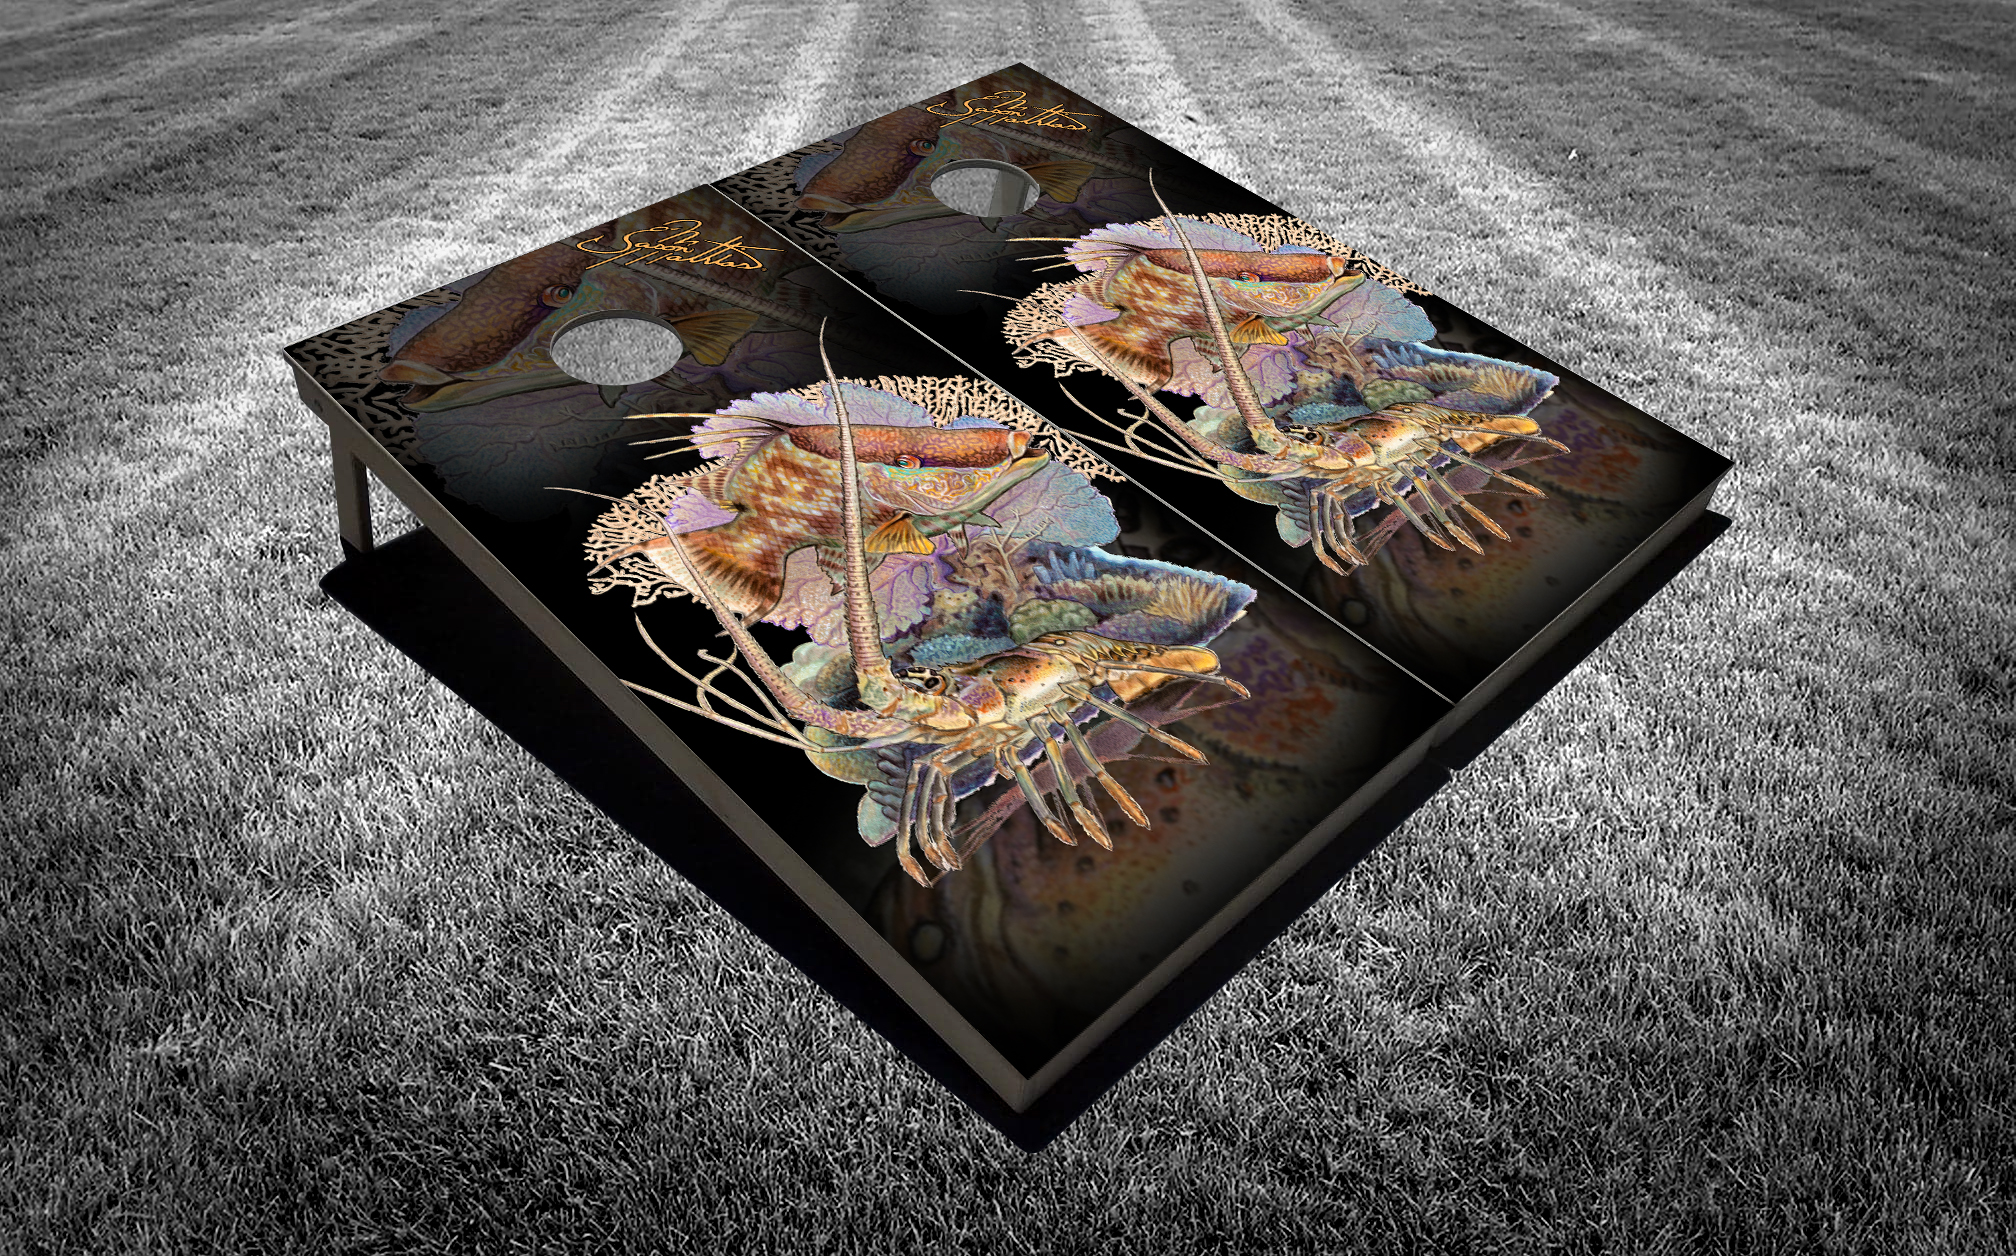 jason-mathias-cornhole-boards-set-hogfish-lobster-artwork.jpg